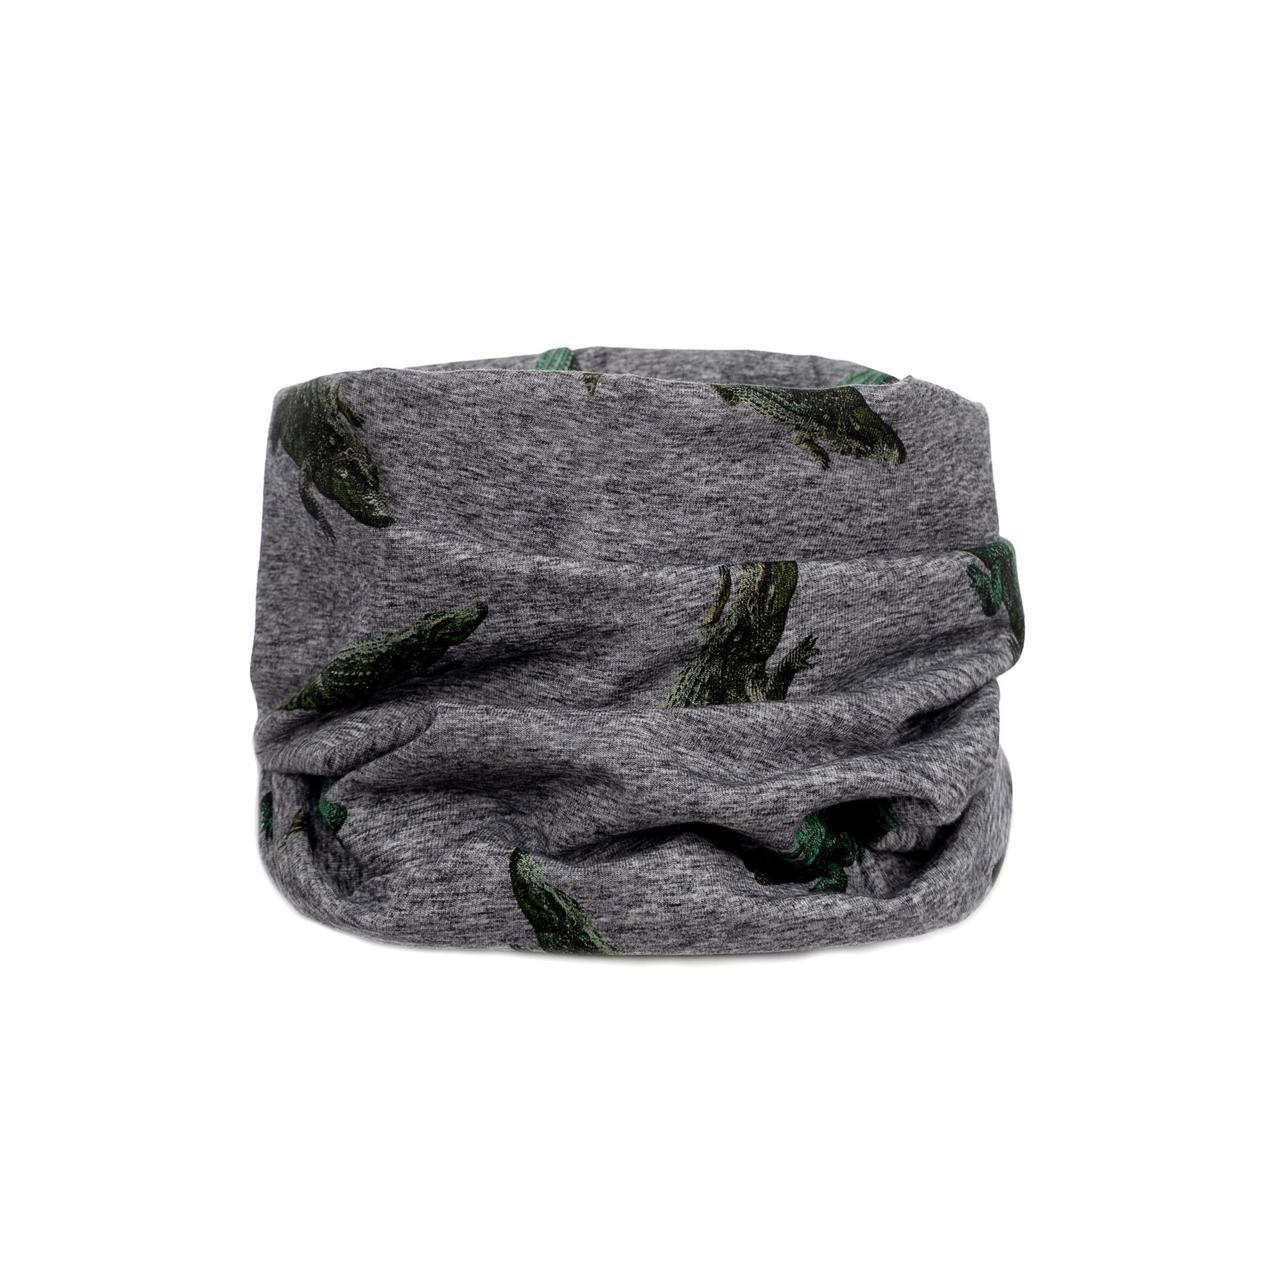 Хомут для мальчика с аллигатором - серый  GIAMO   ADB03